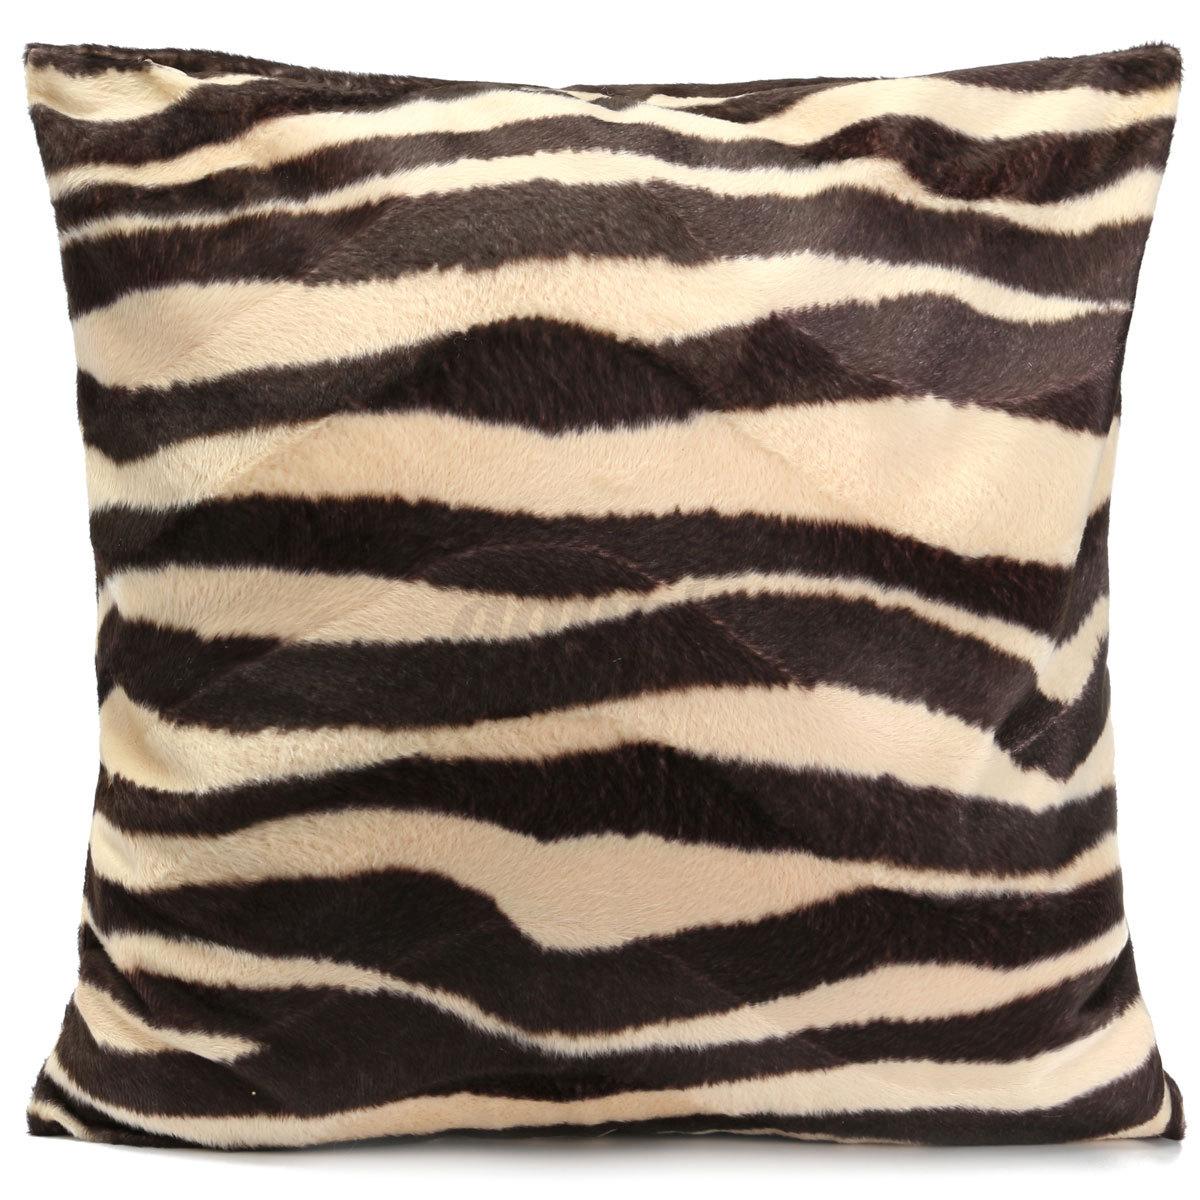 Animal Print Pillow Covers : Fashion Square Pillow Cases Animal Print Leopard Zebra Cushion Covers Sofa Car eBay